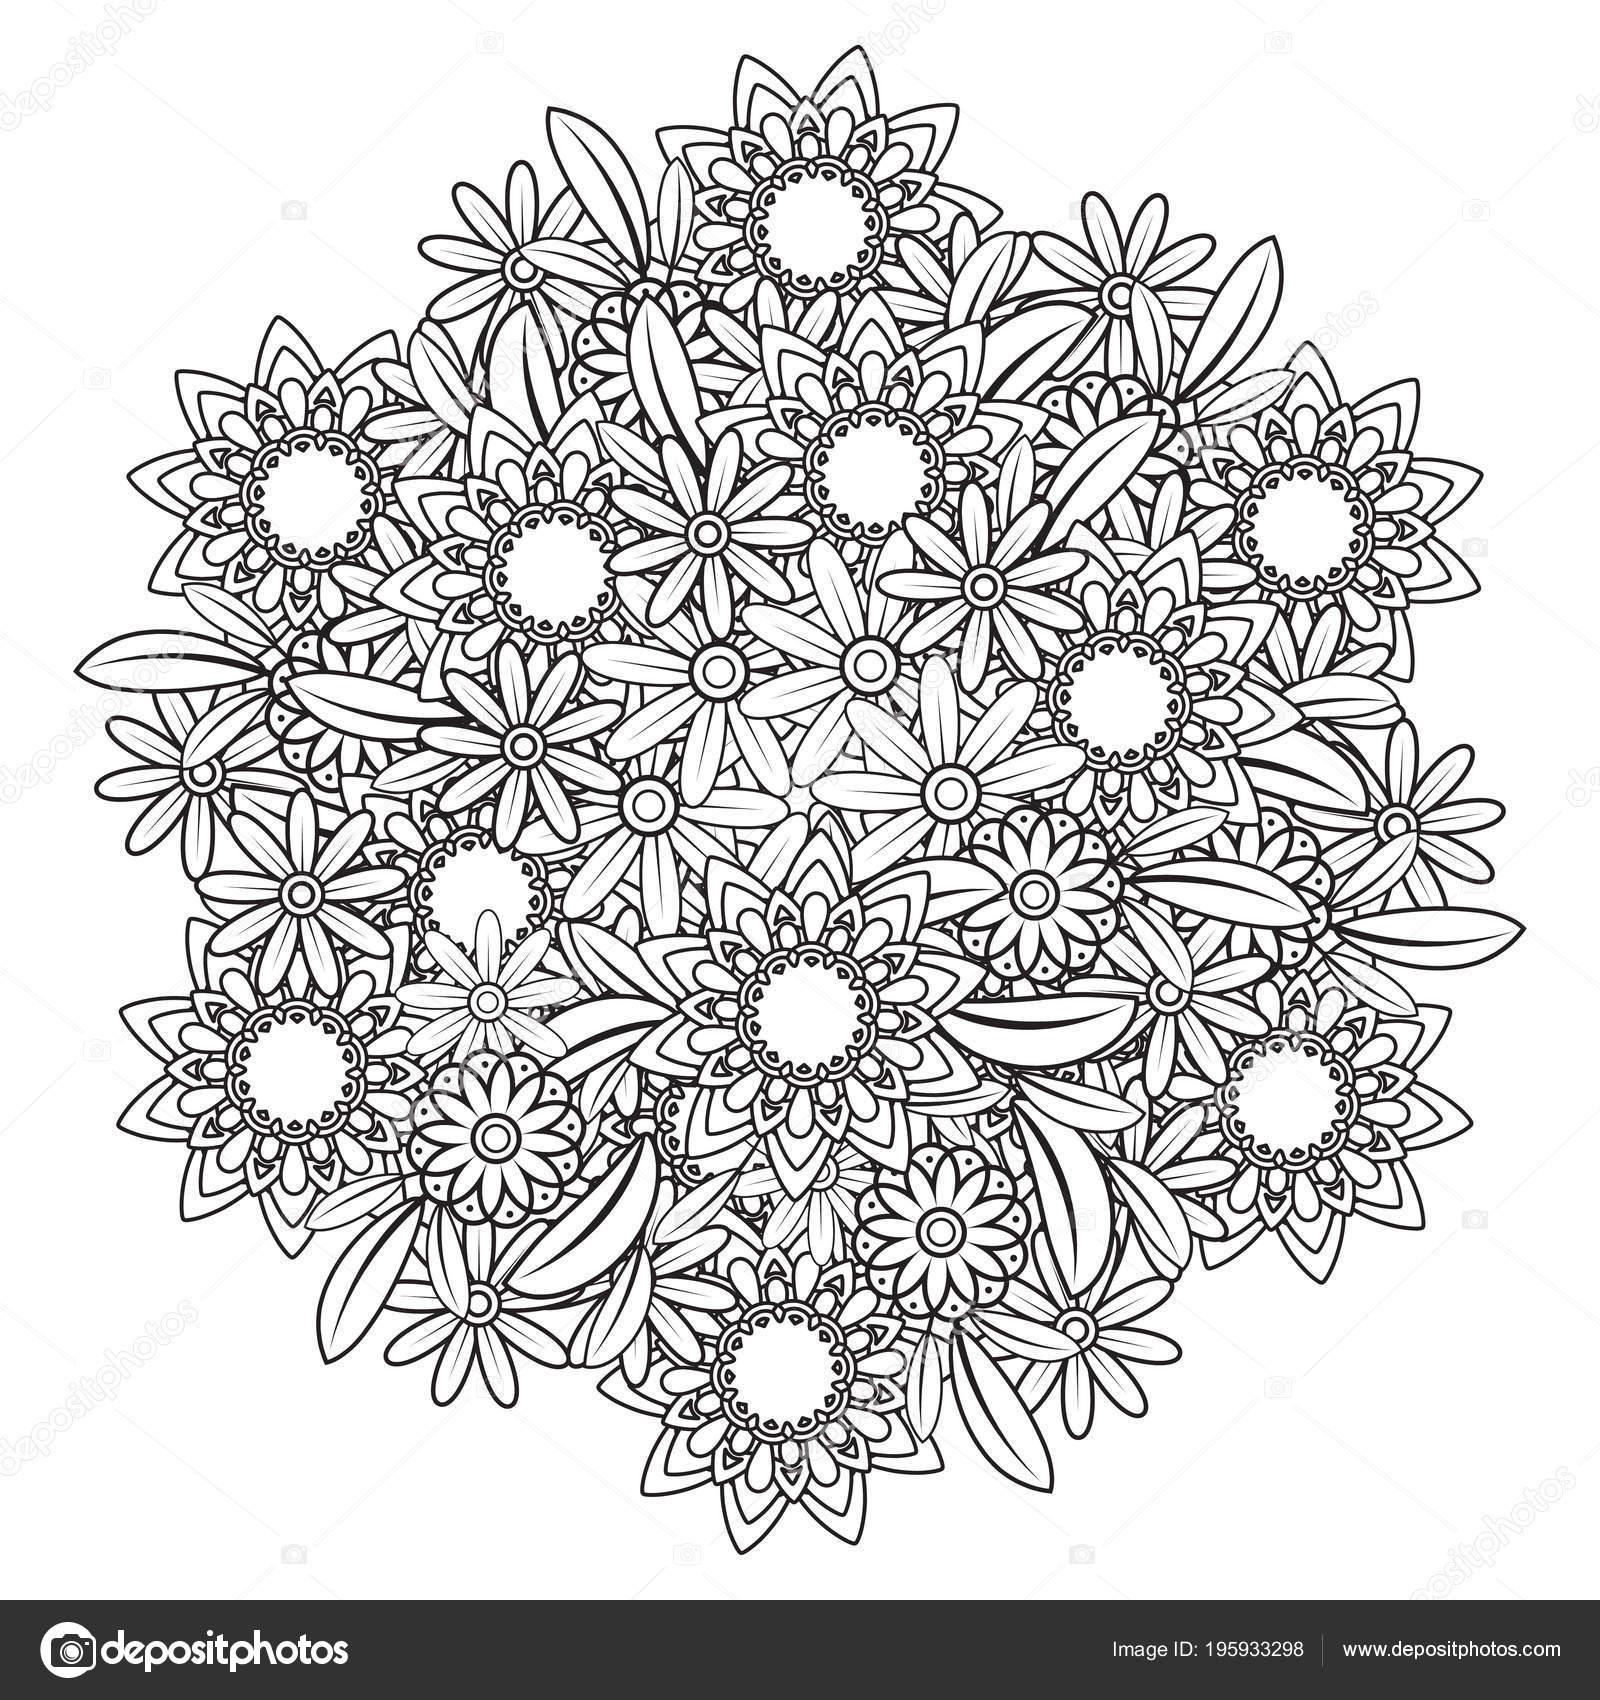 Verwonderend Bloemen Mandala patroon — Stockvector © elinorka #195933298 IO-66